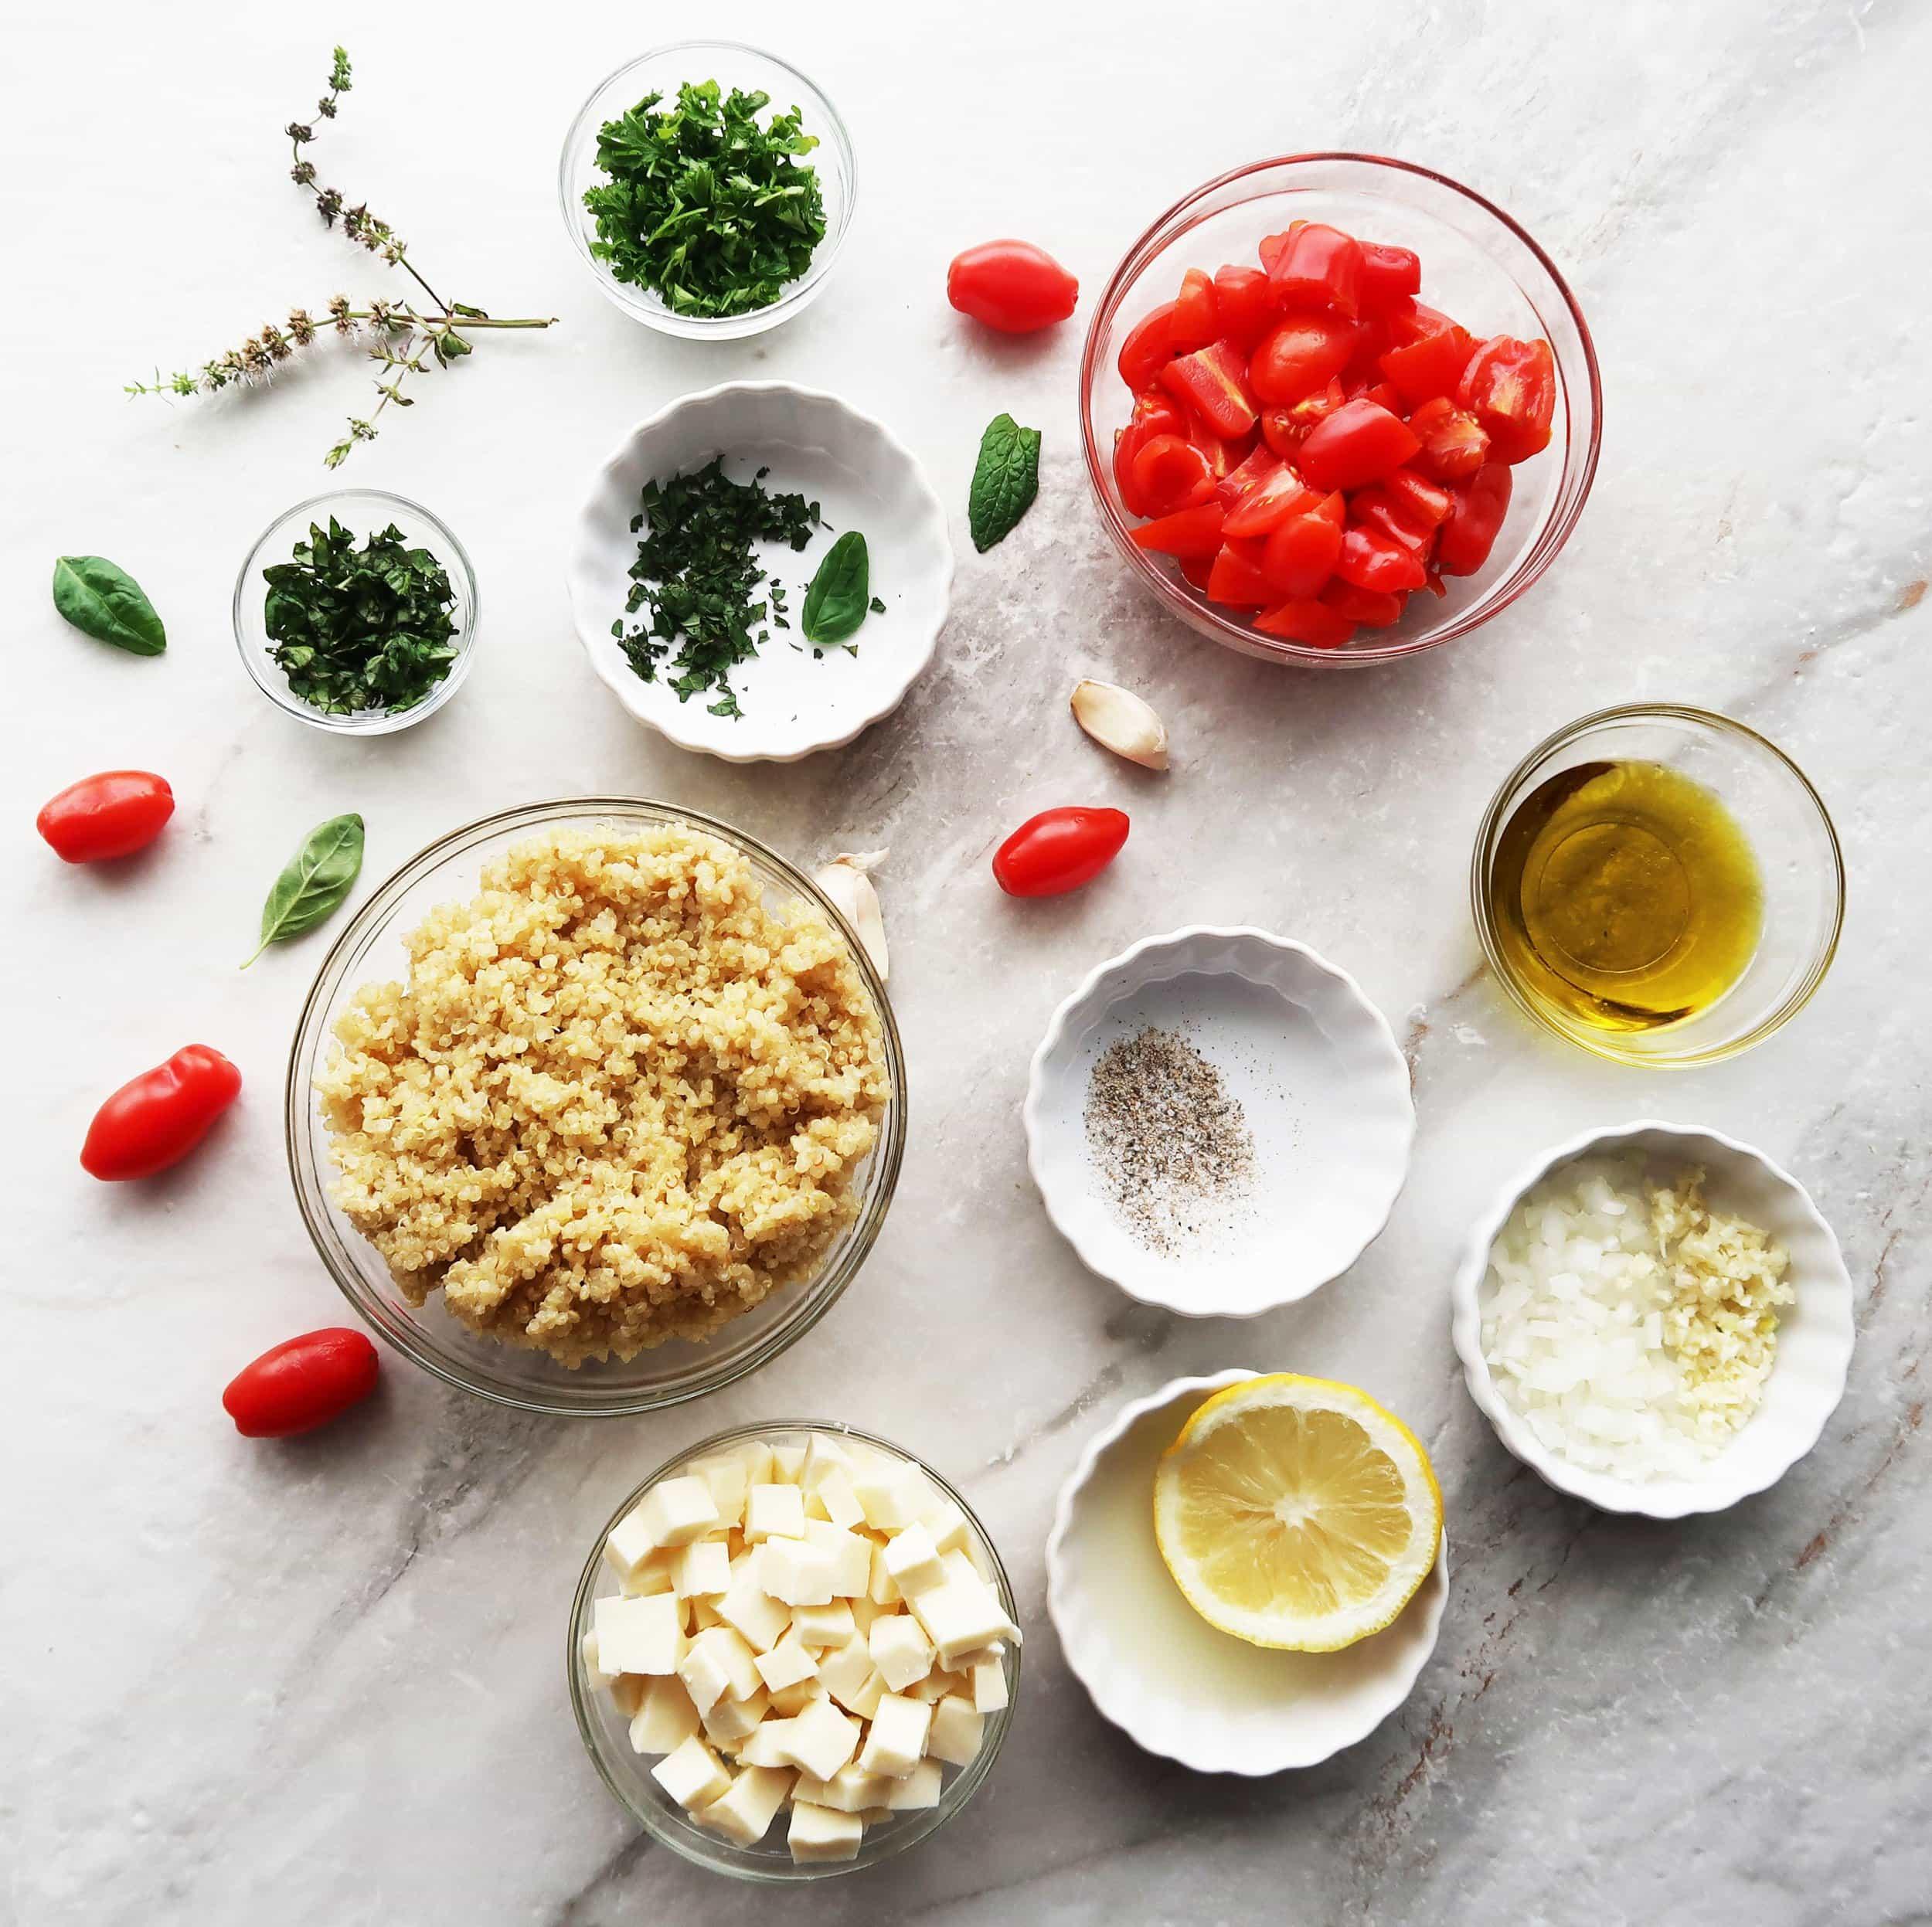 Quinoa, mozzarella, tomatoes, olive oil, herbs, and lemon.